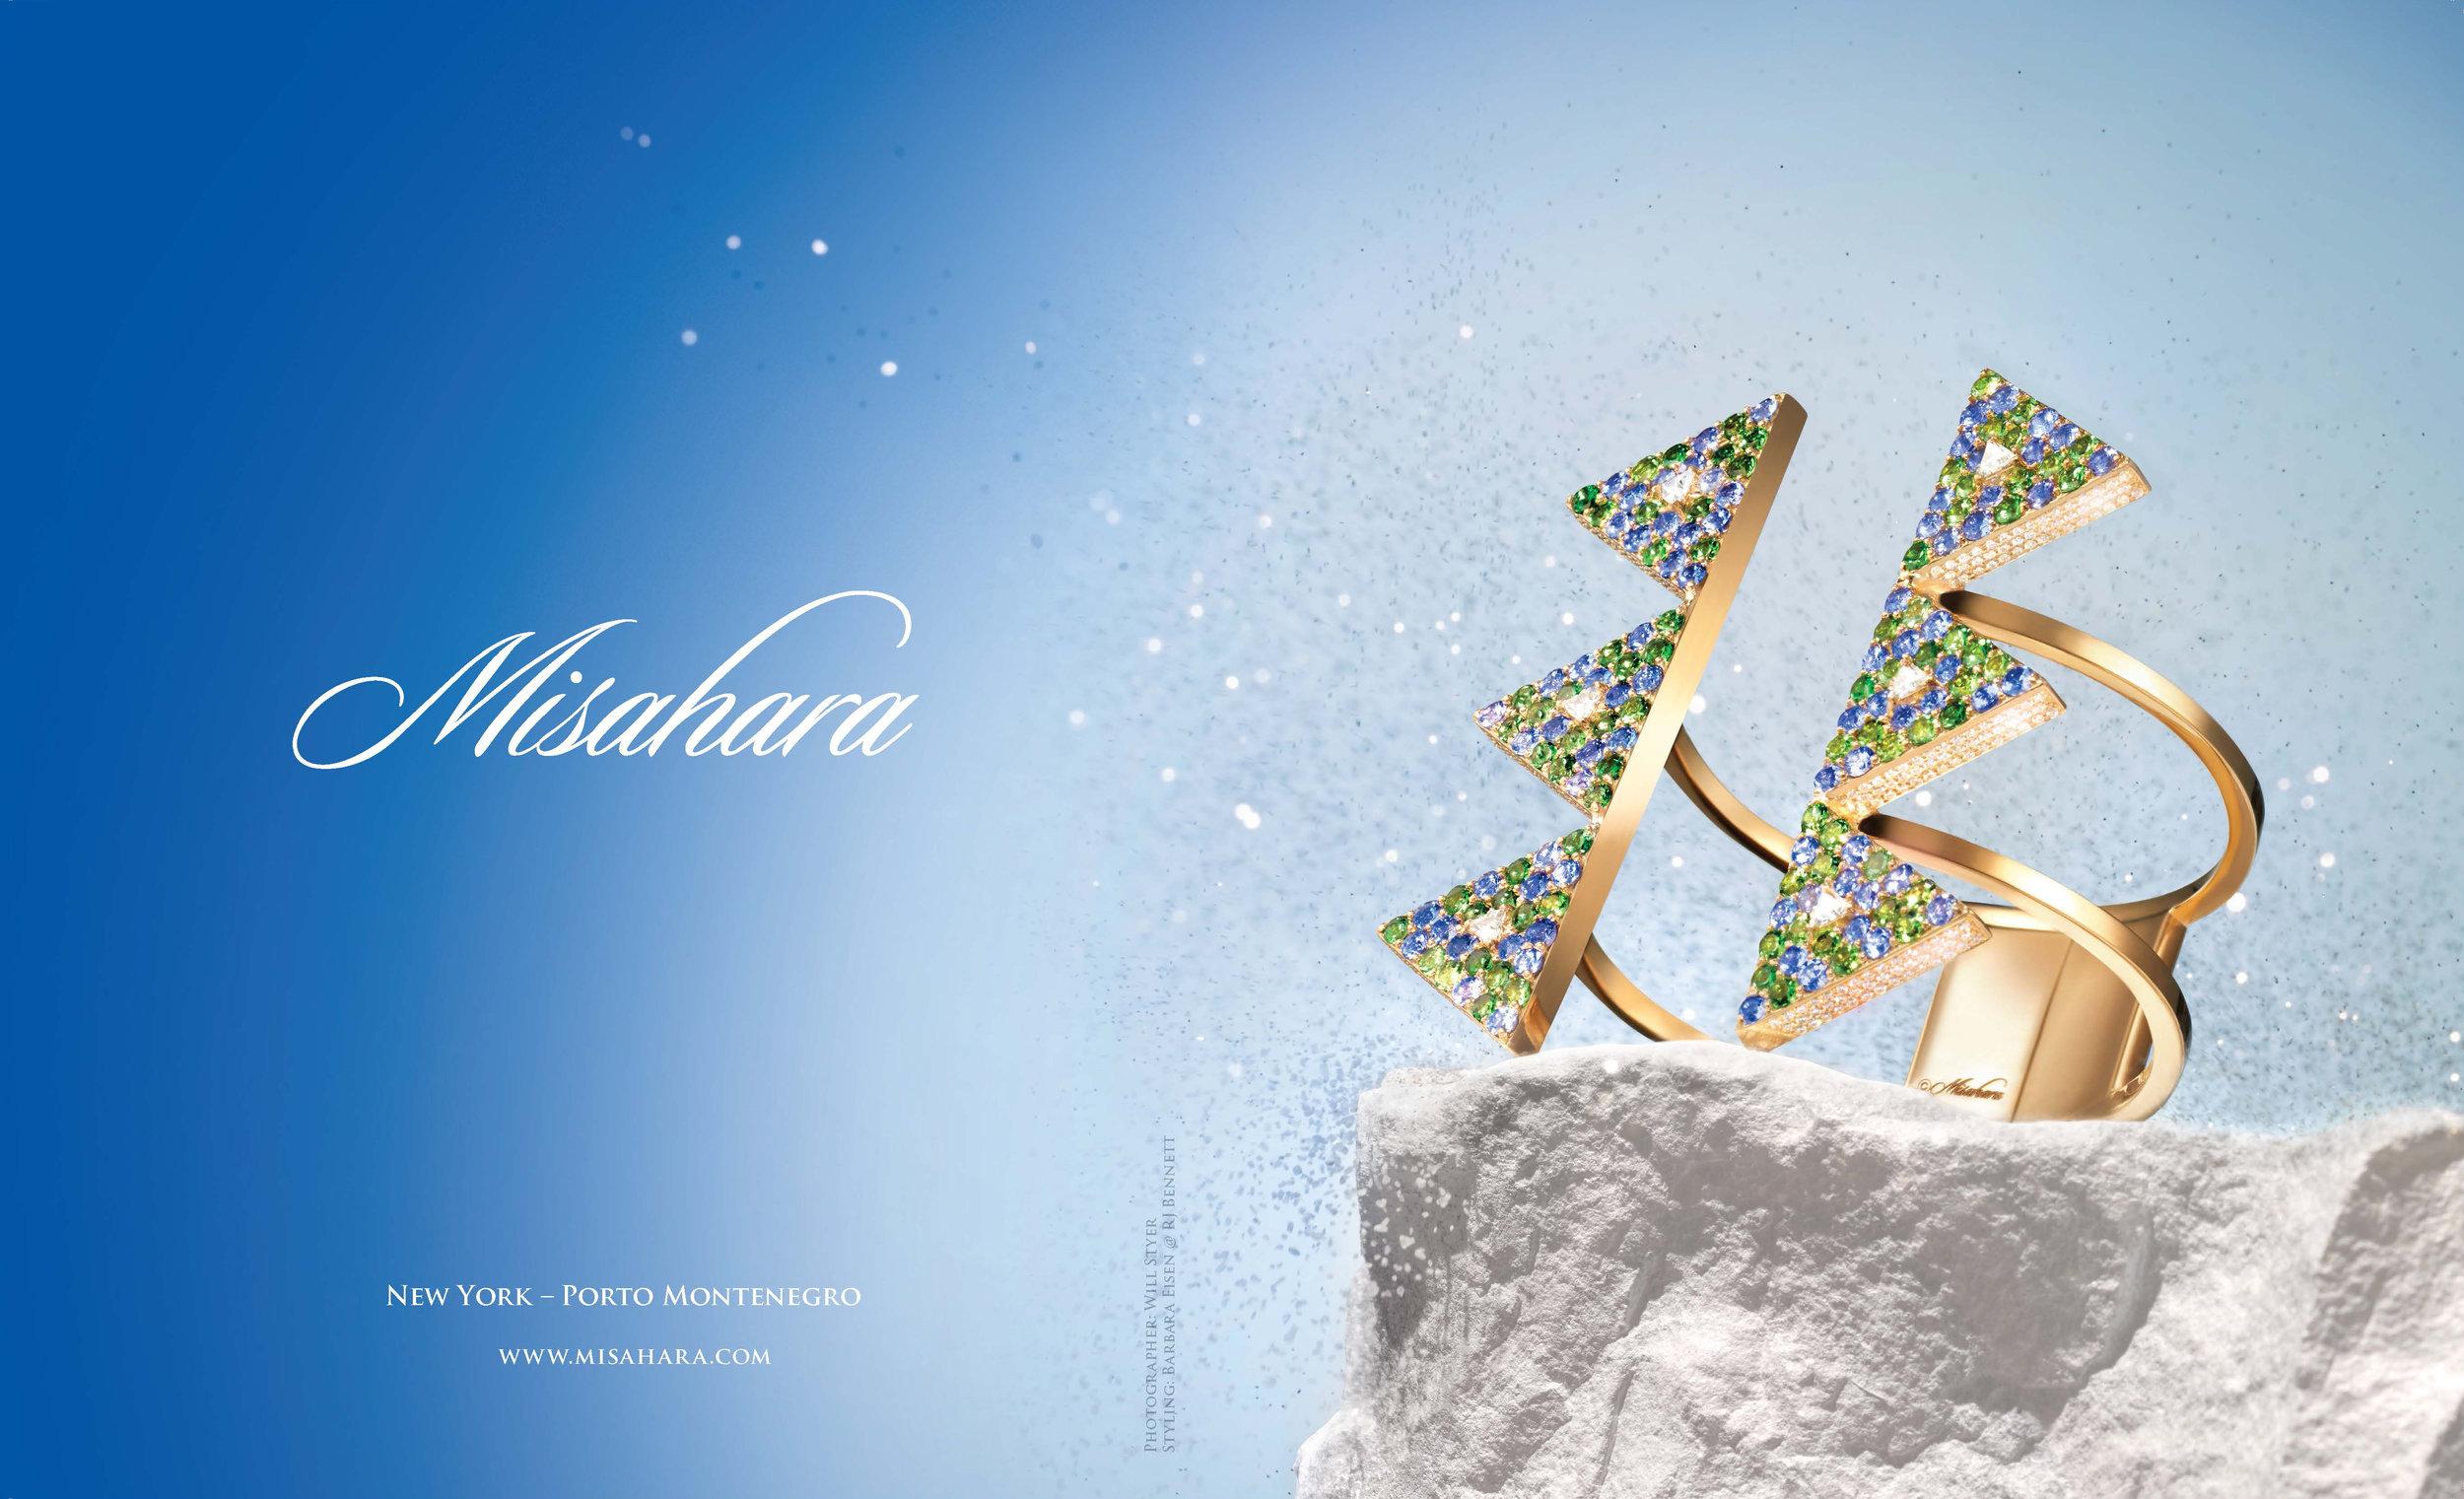 Misahara Vogue Met Gala.jpg